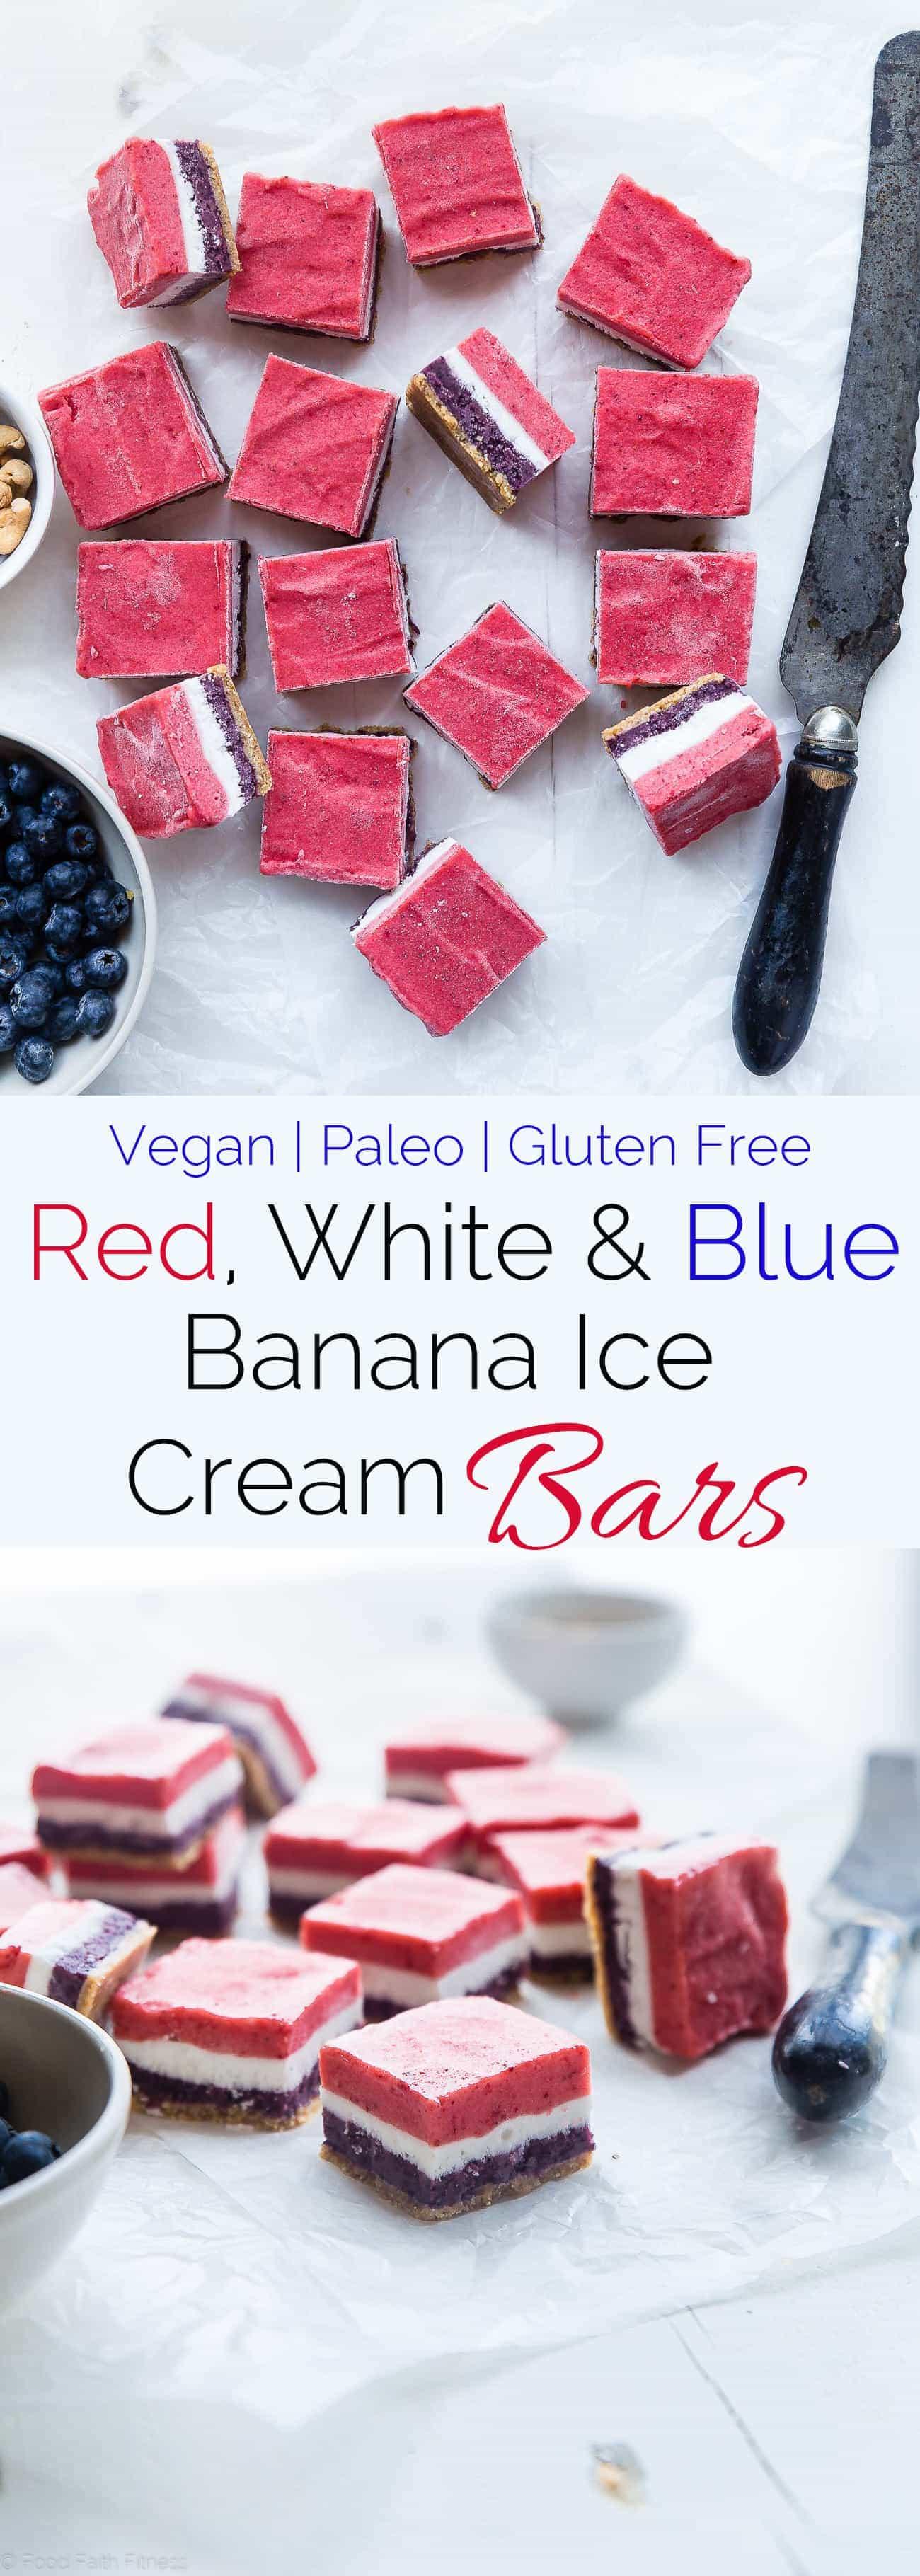 Banana ice cream bars collage image. Recipe on foodfaithfitness.com